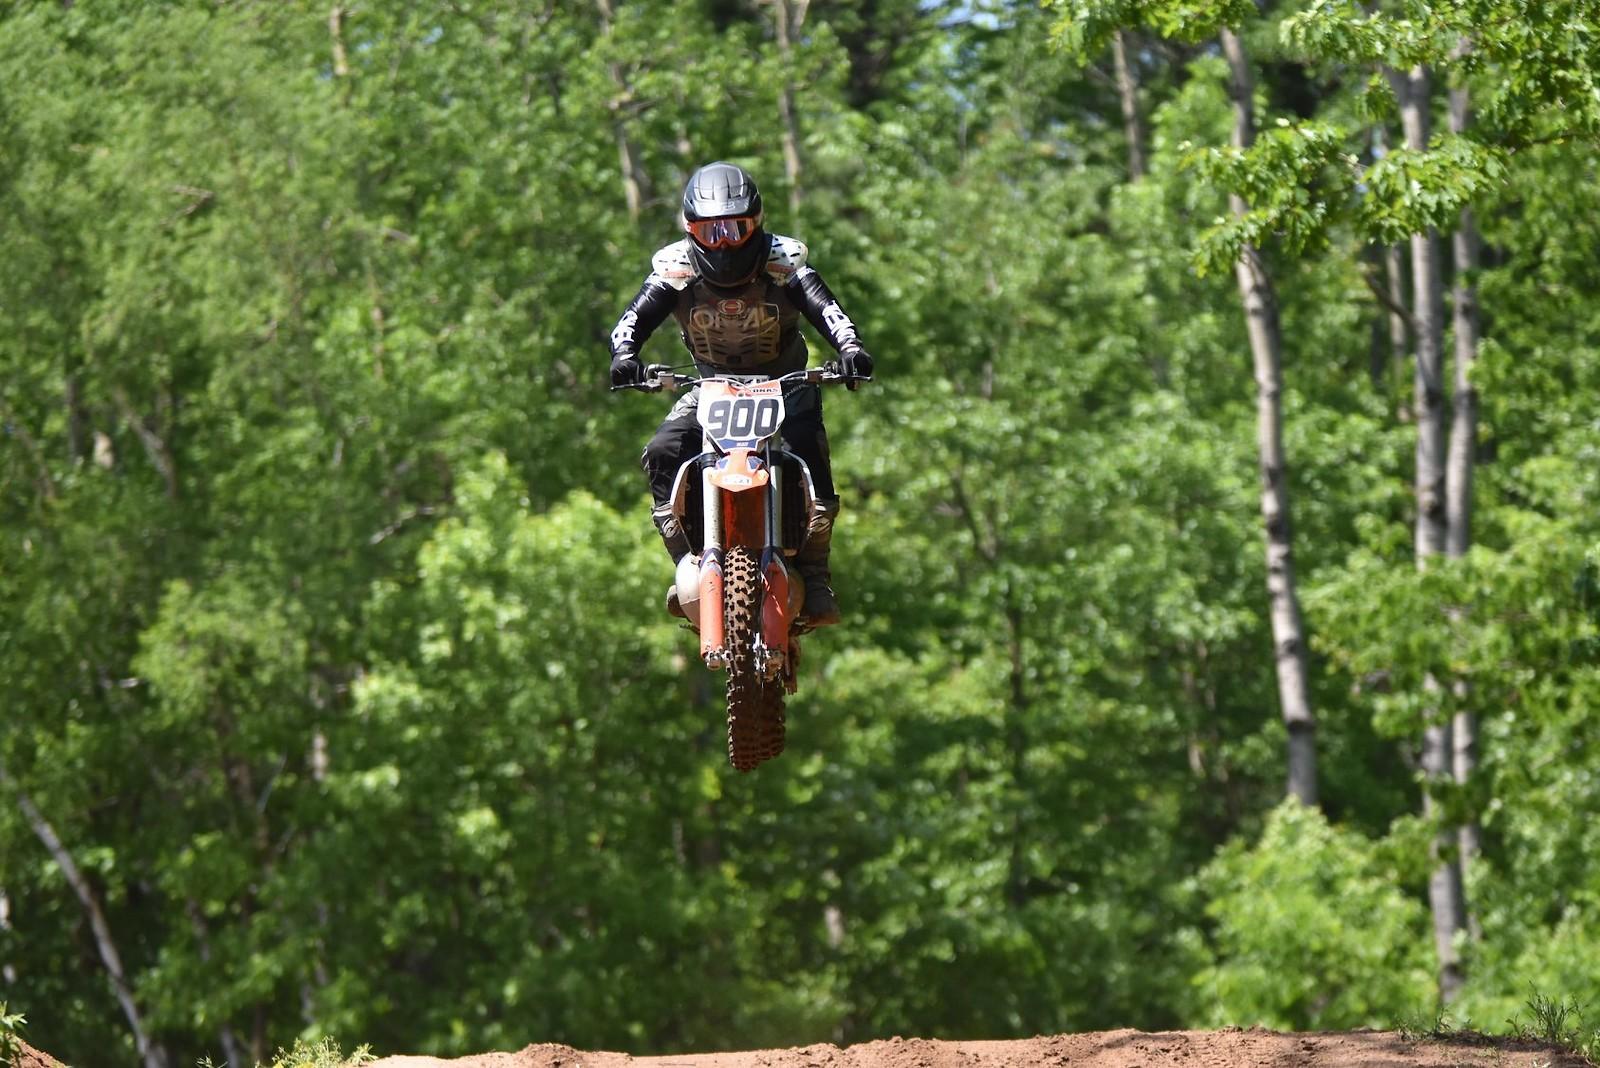 62602571 2256561044596319 2113337171938115584 o - Jeremy_Jonas - Motocross Pictures - Vital MX